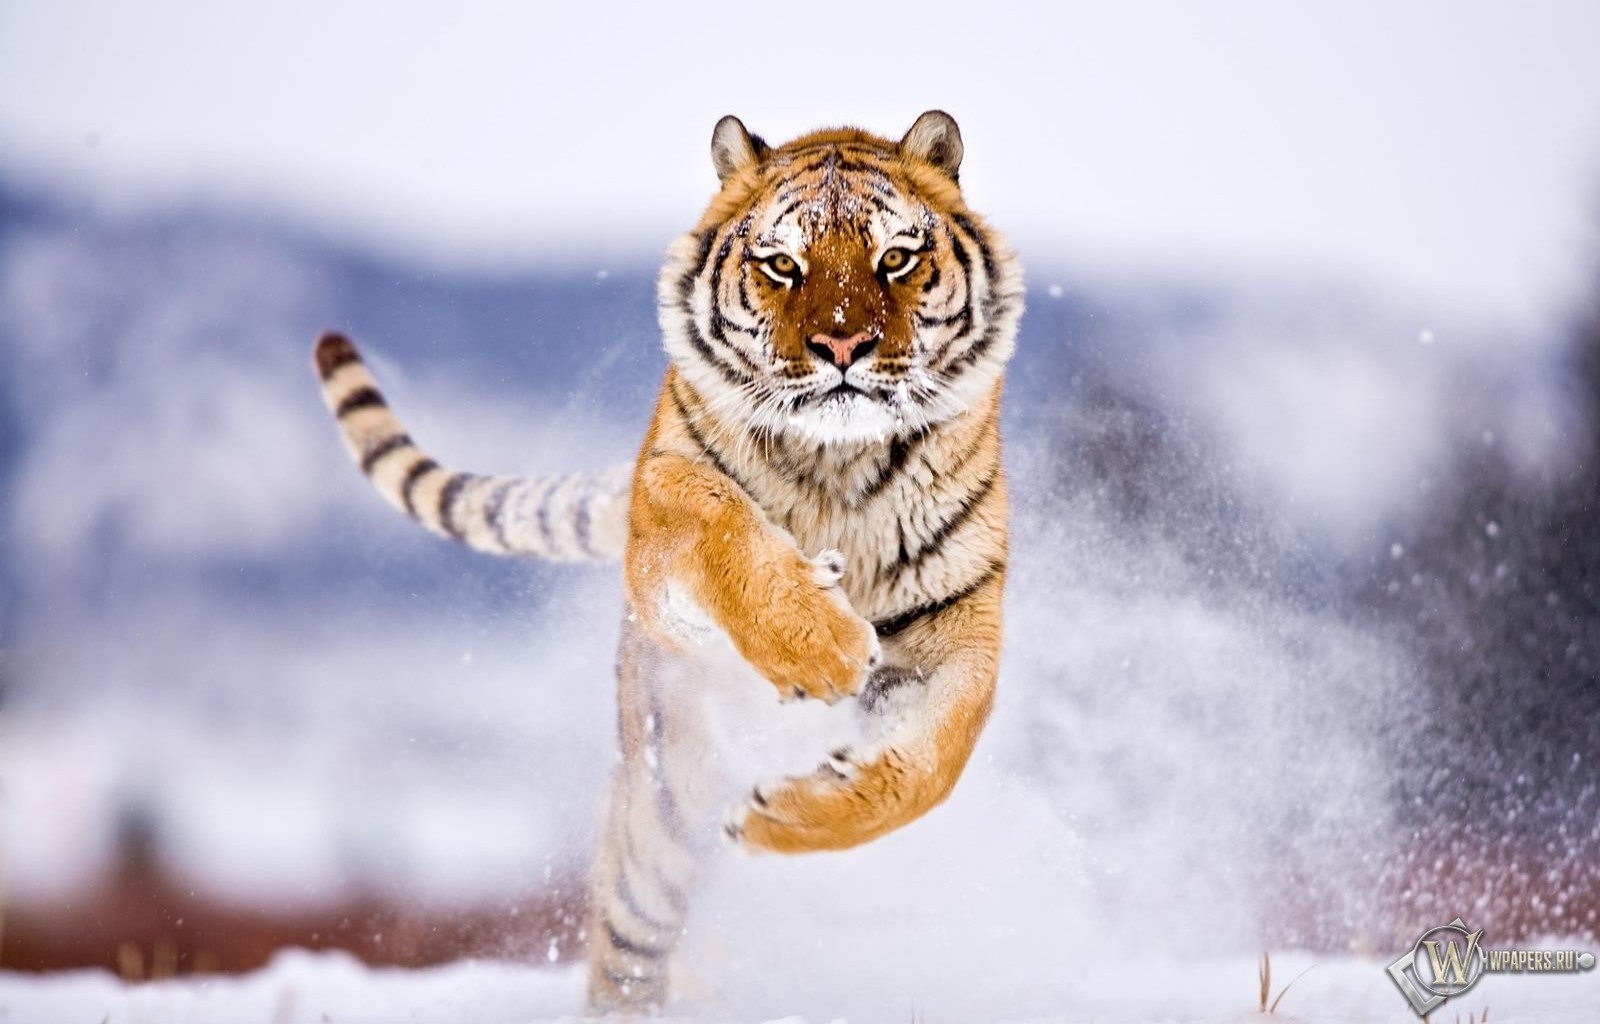 Тигр бежит по снегу 1600x1024